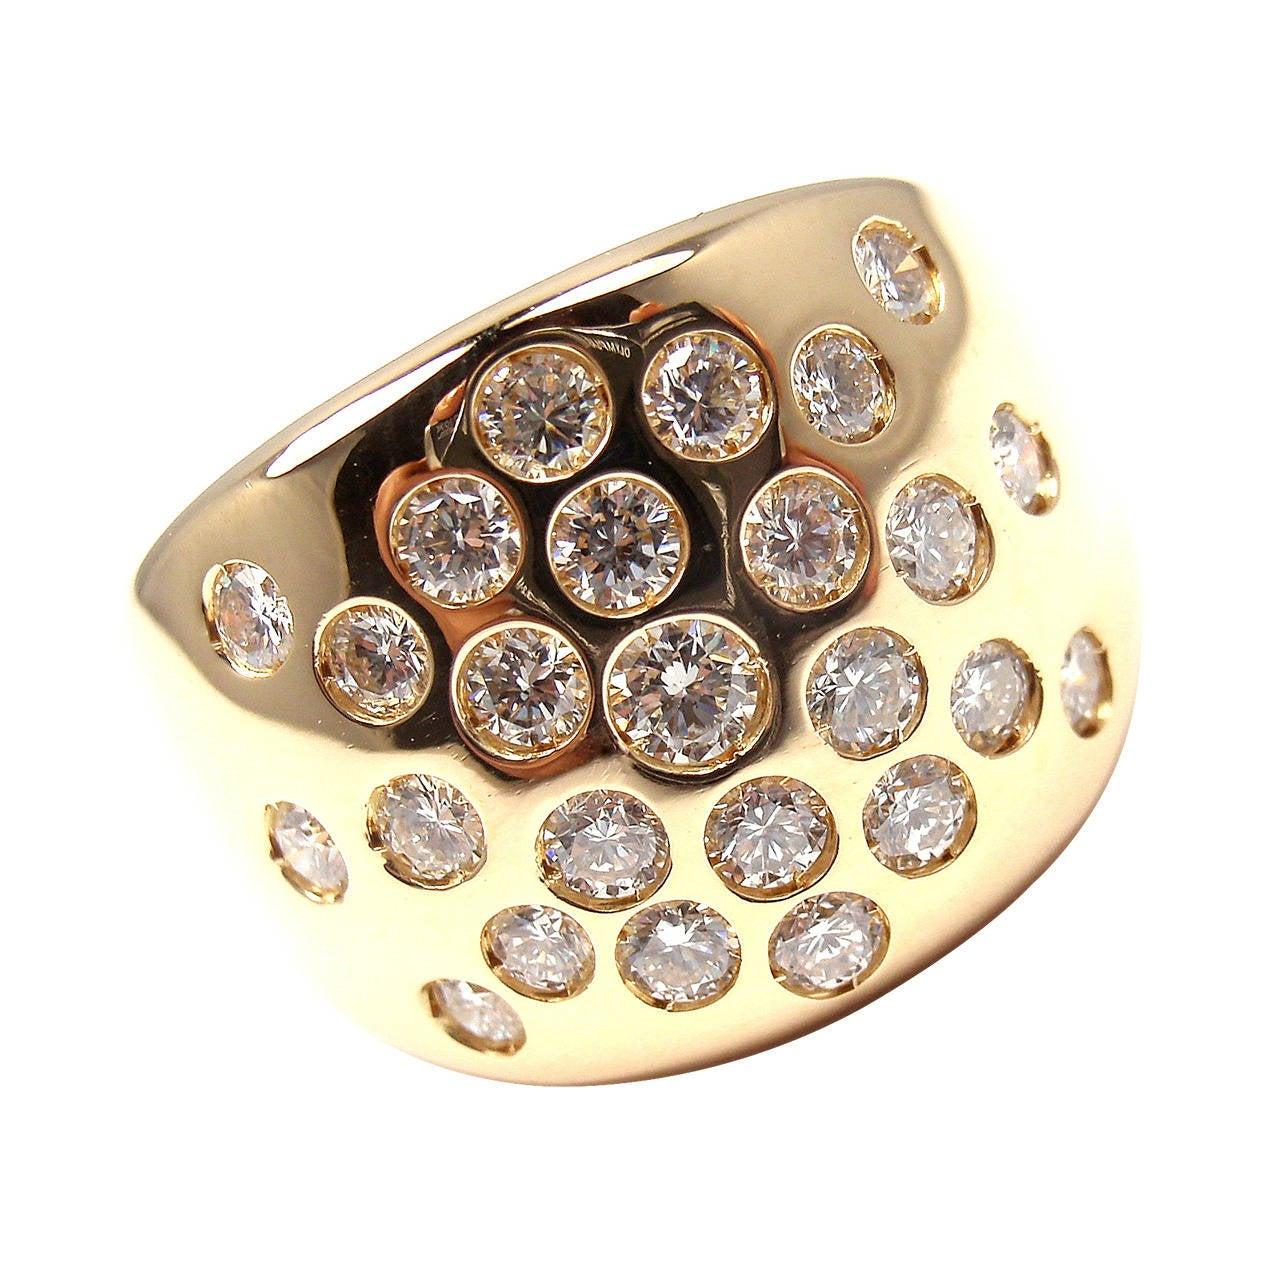 Hermes Diamond Gold Cocktail Ring